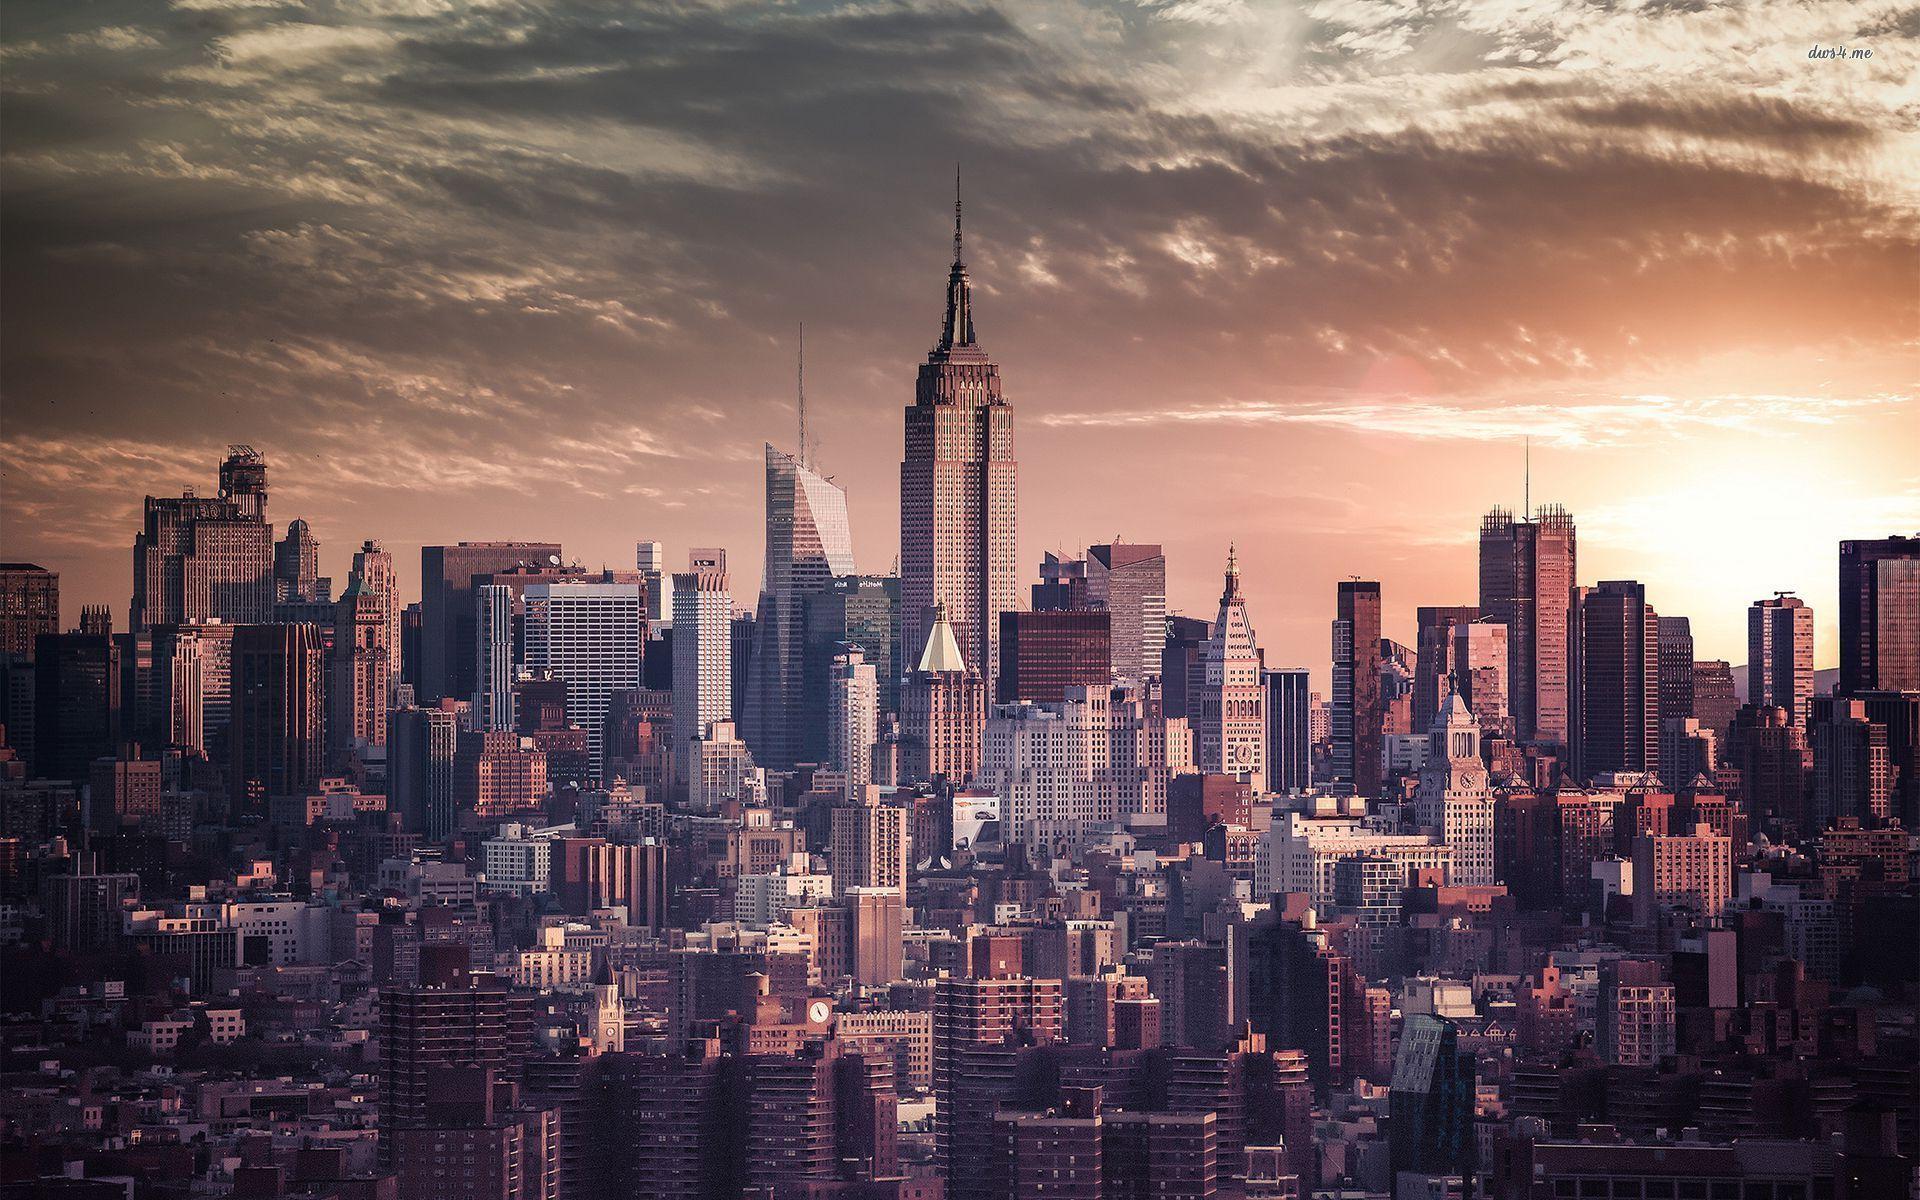 New York City Wallpaper HD 1920x1200